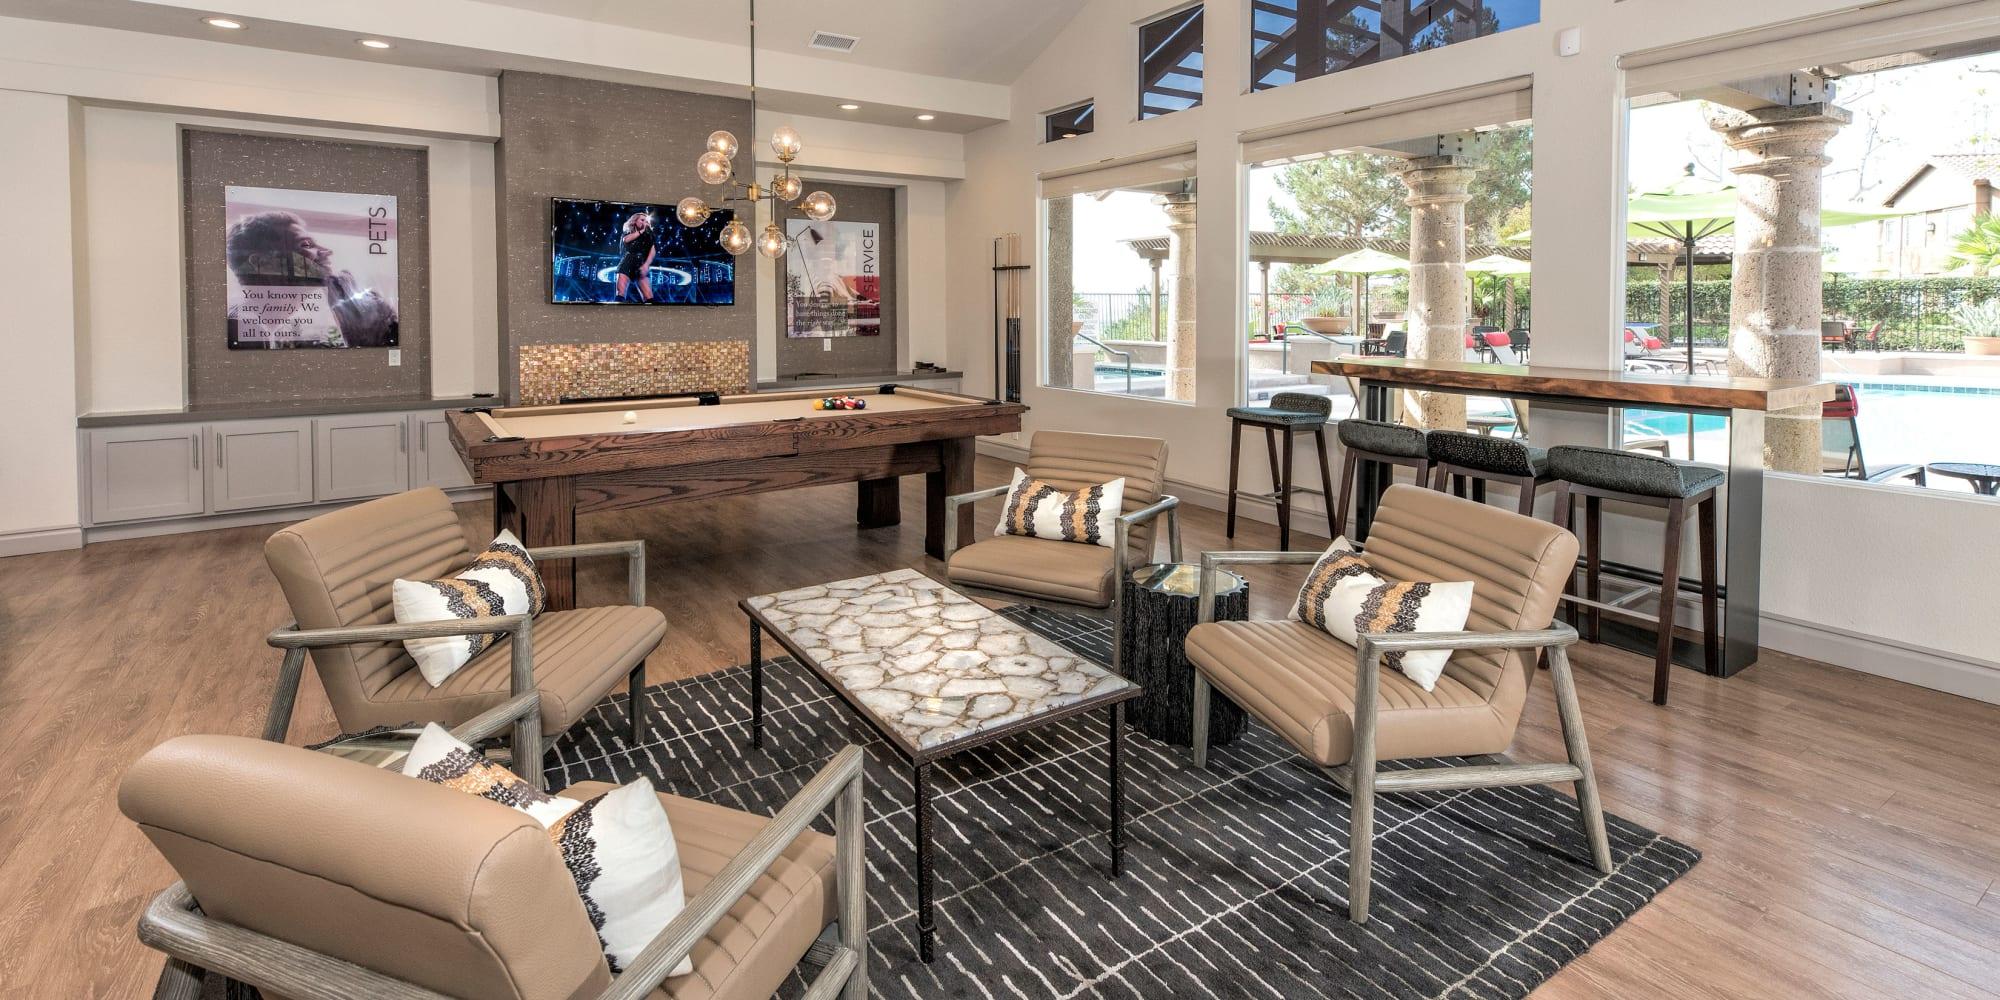 Apartments at Paloma Summit Condominium Rentals in Foothill Ranch, California